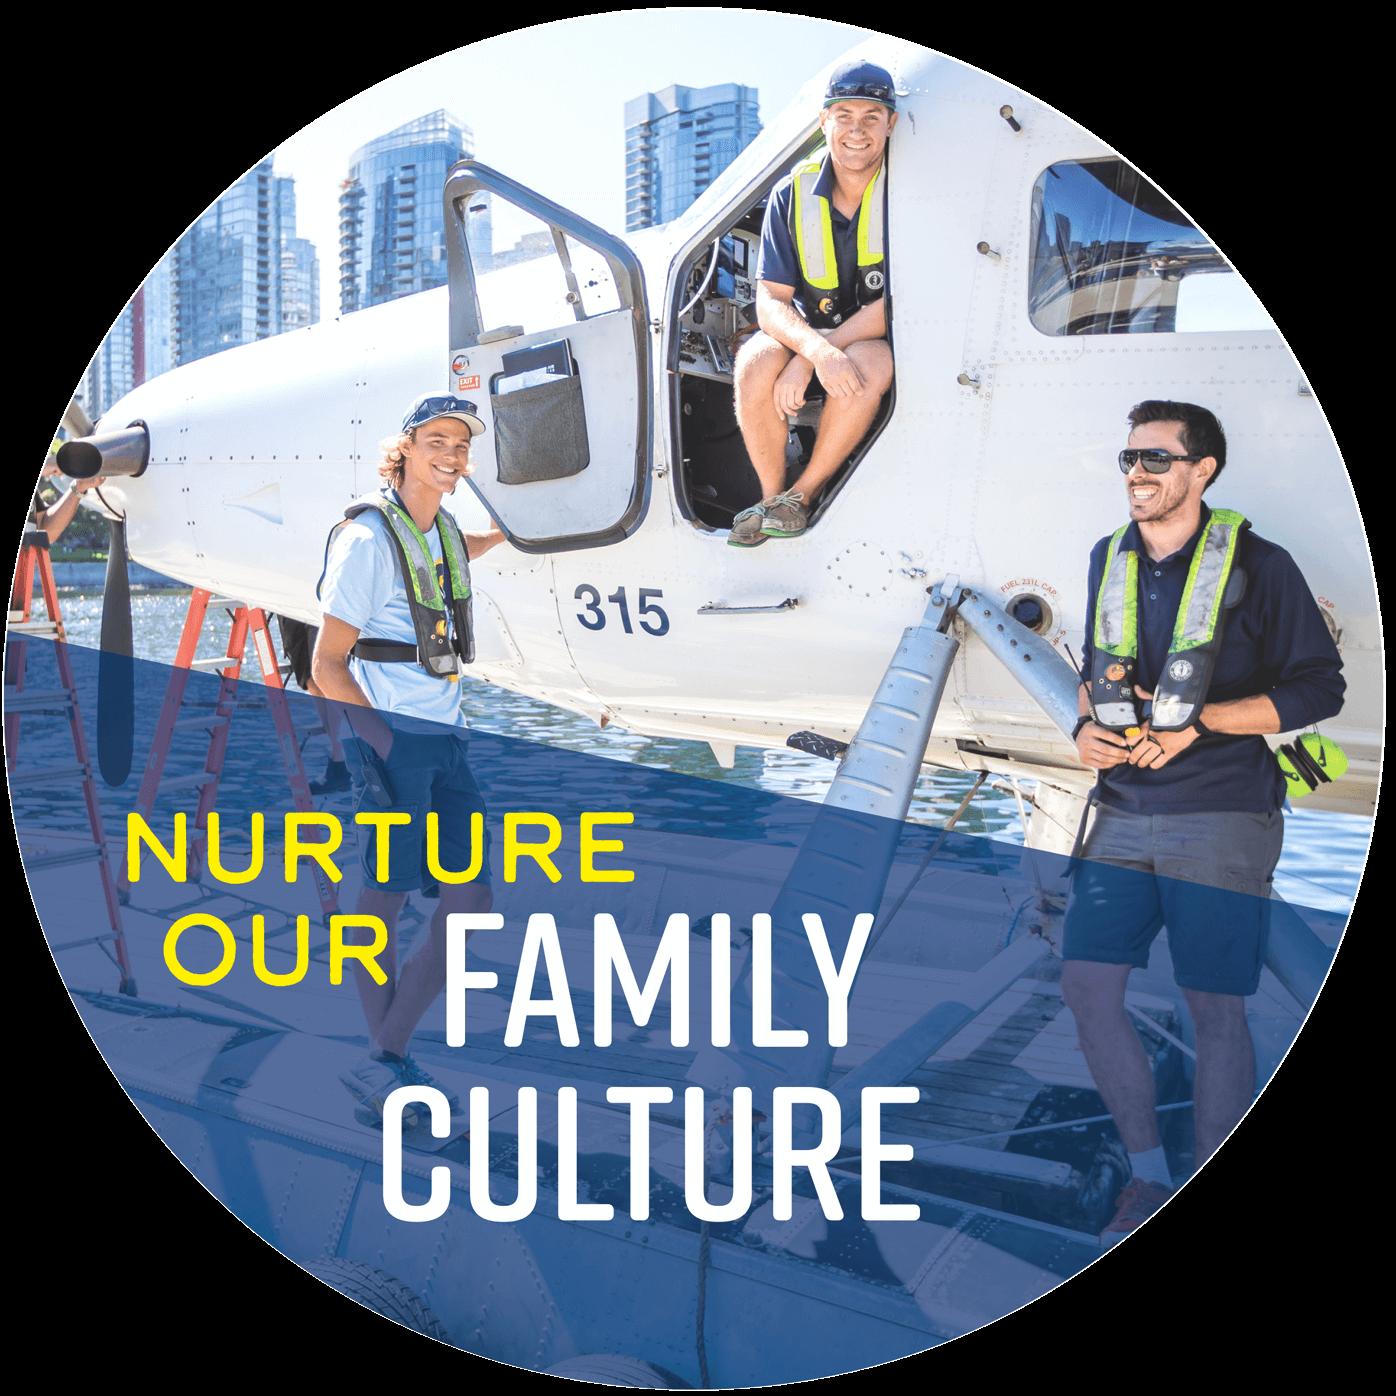 Nurture our family culture